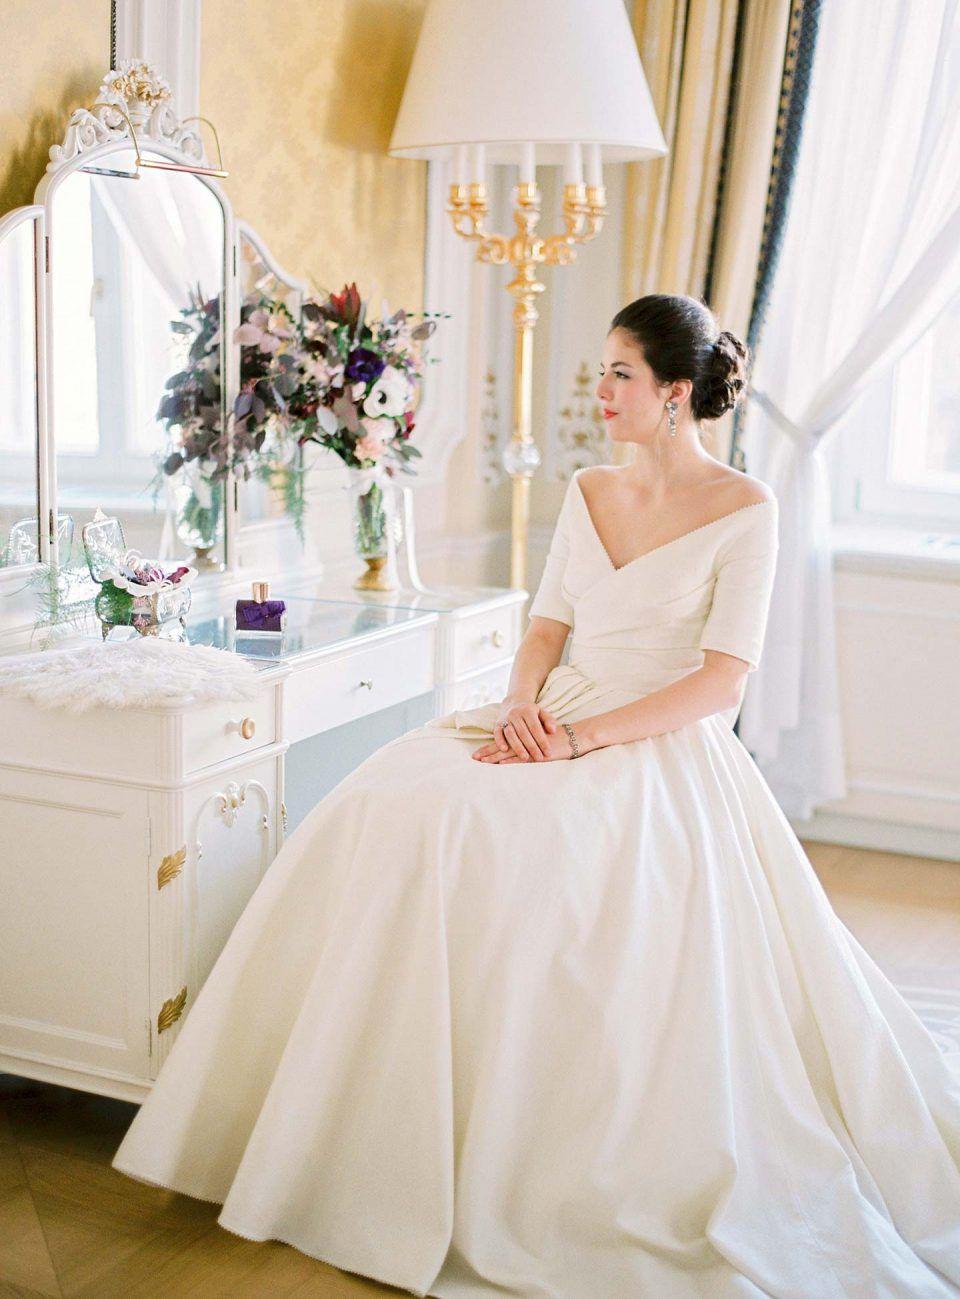 Princess & Prince Charming in Wien | Princess wedding, Wedding dress ...